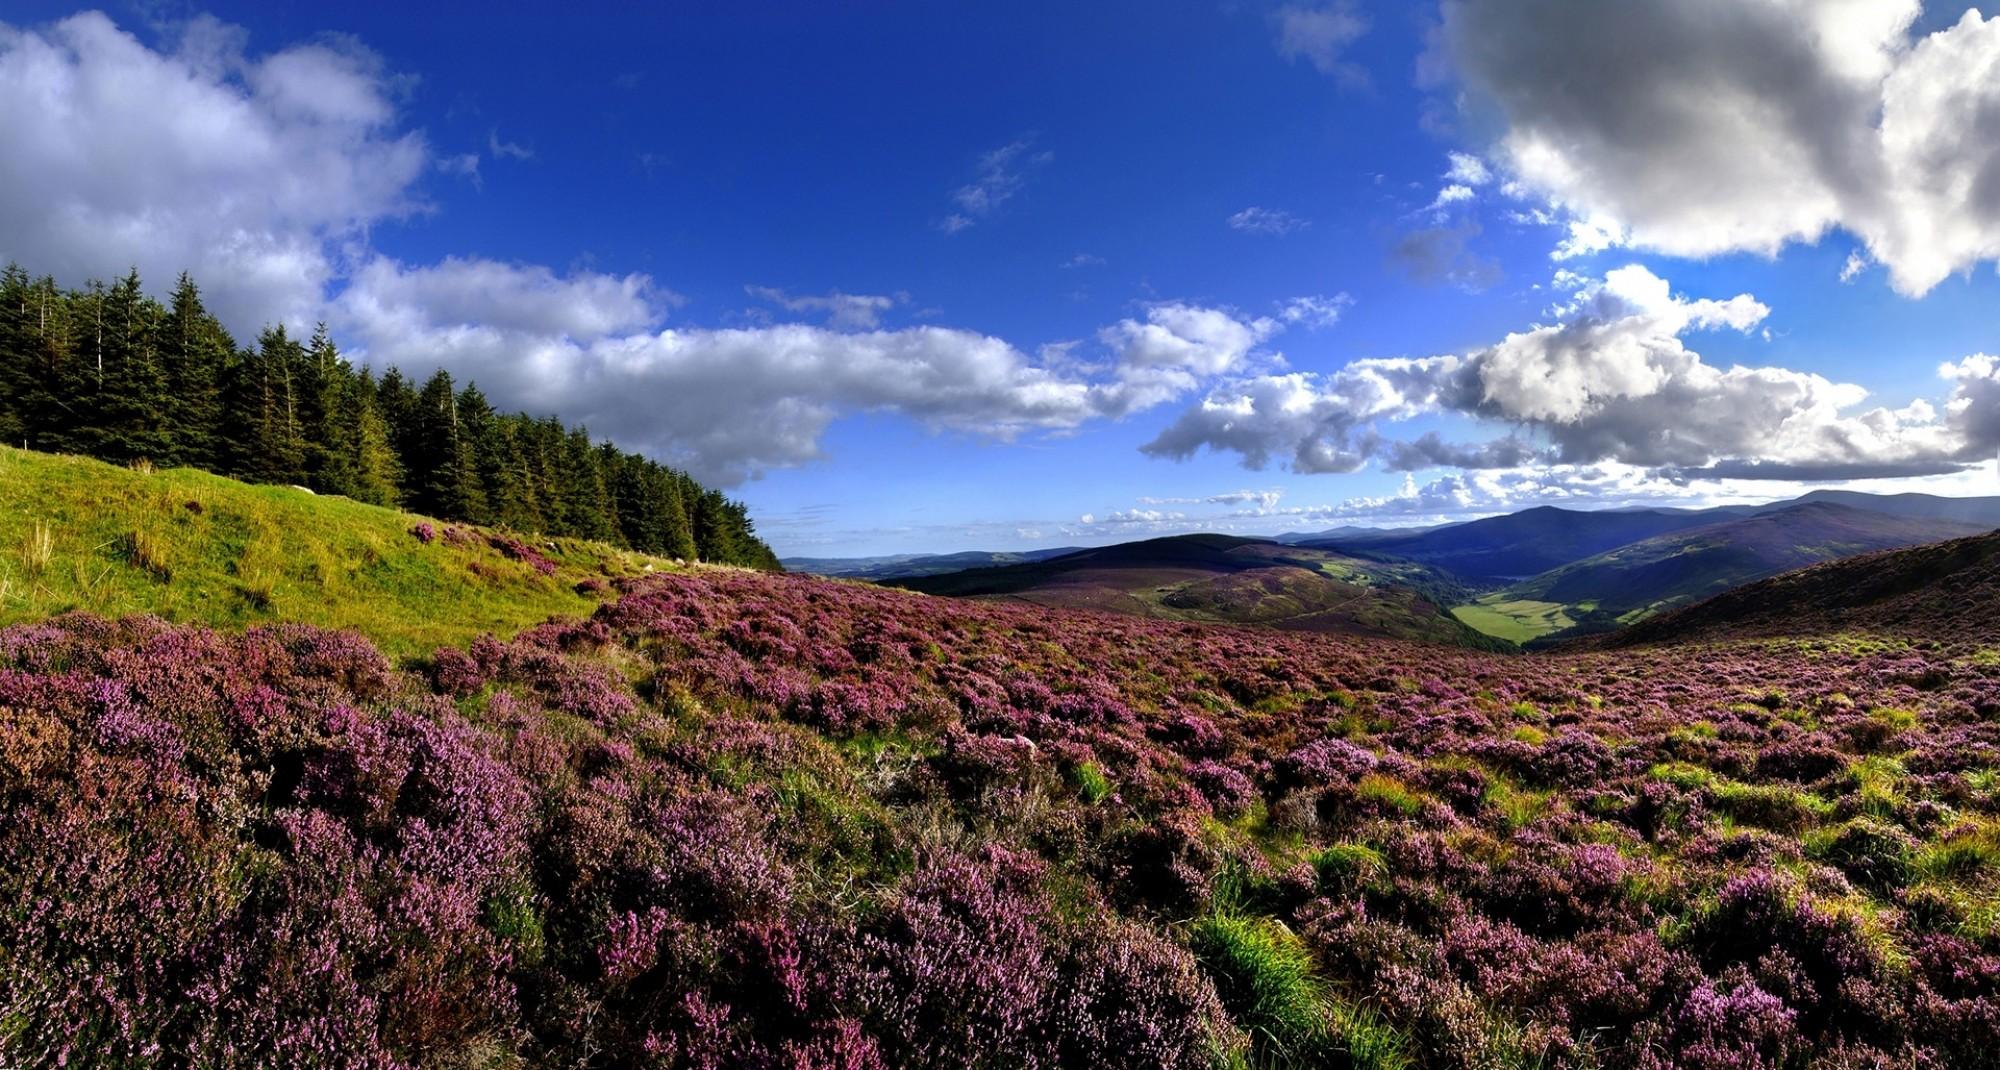 Wicklow Hills Wicklow Tourism Ireland Chris Hill